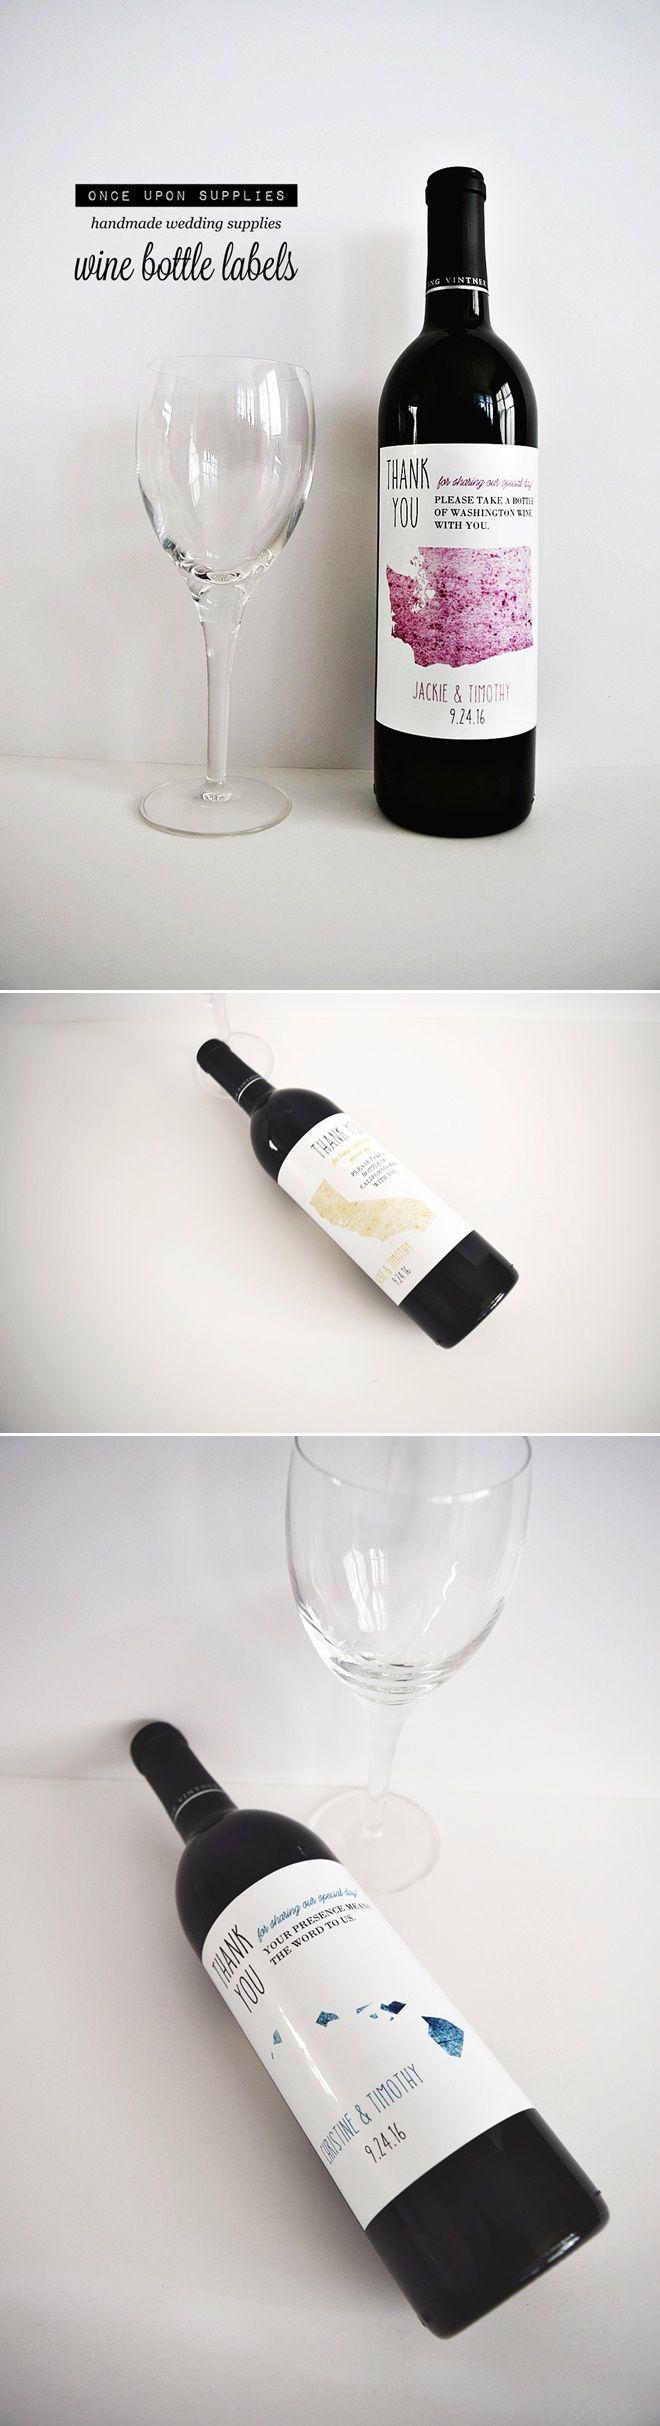 18 best Wine Bottle Labels images on Pinterest   Wine bottle ...